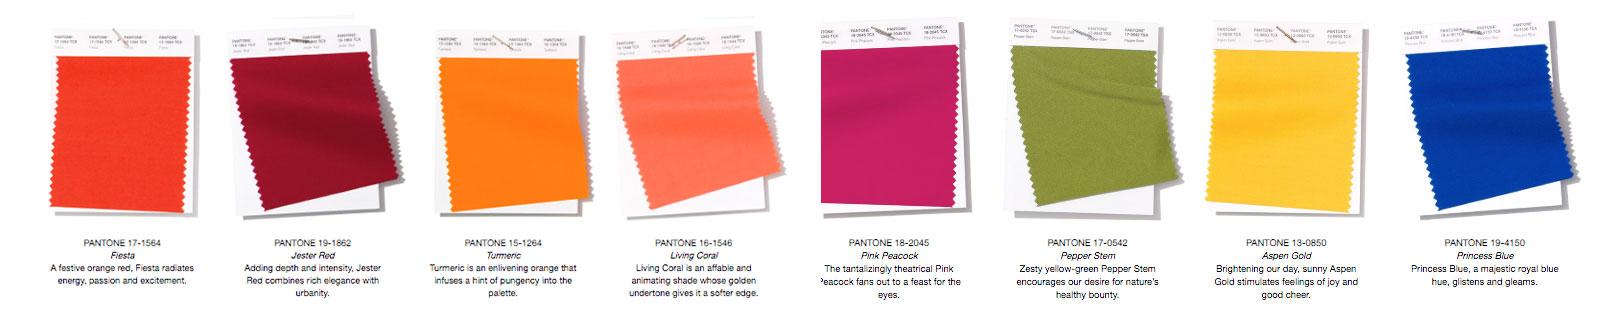 pantone color 2019